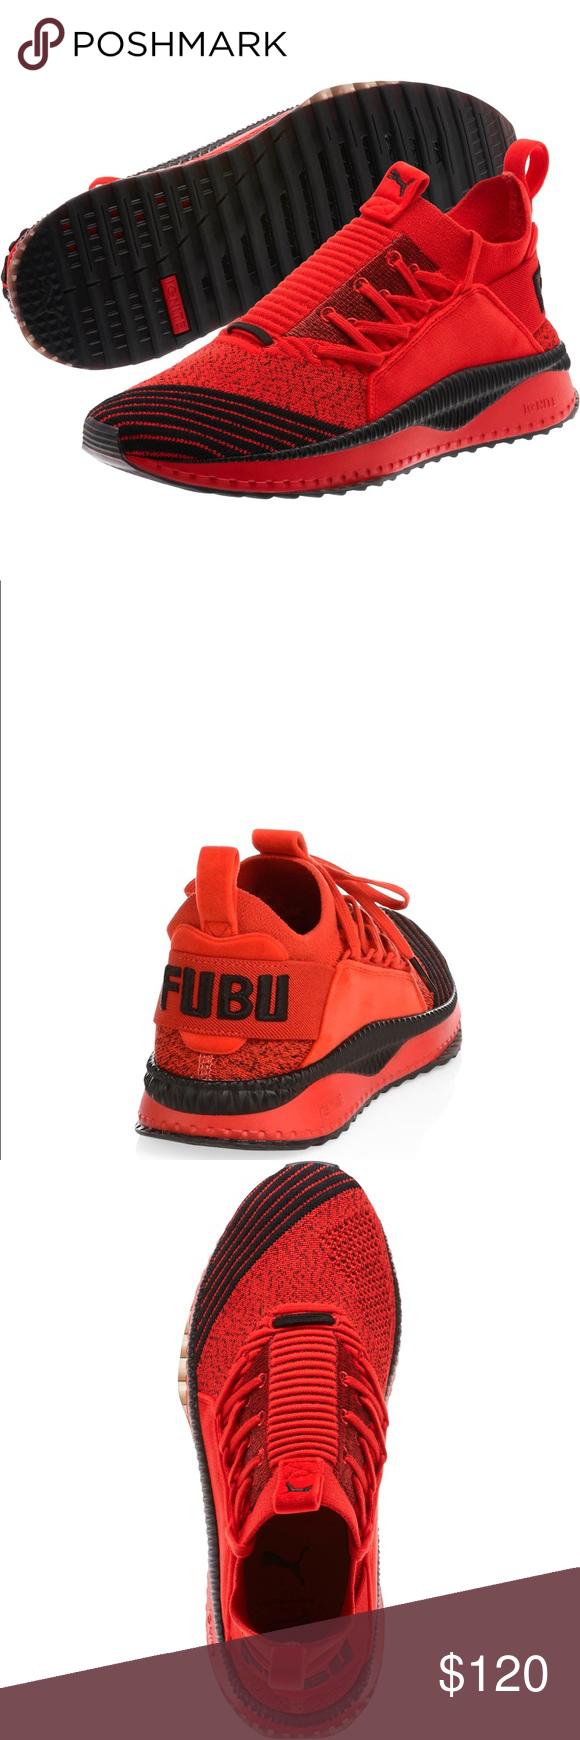 591023e7a9f2c1 Puma Tsugi Jun High Fubu Knits Brand new AUTHENTIC Puma TSUGI JUN Running Sneakers  Fubu High Risk Red Black Sizes 9.5 and 12 Puma Shoes Athletic Shoes